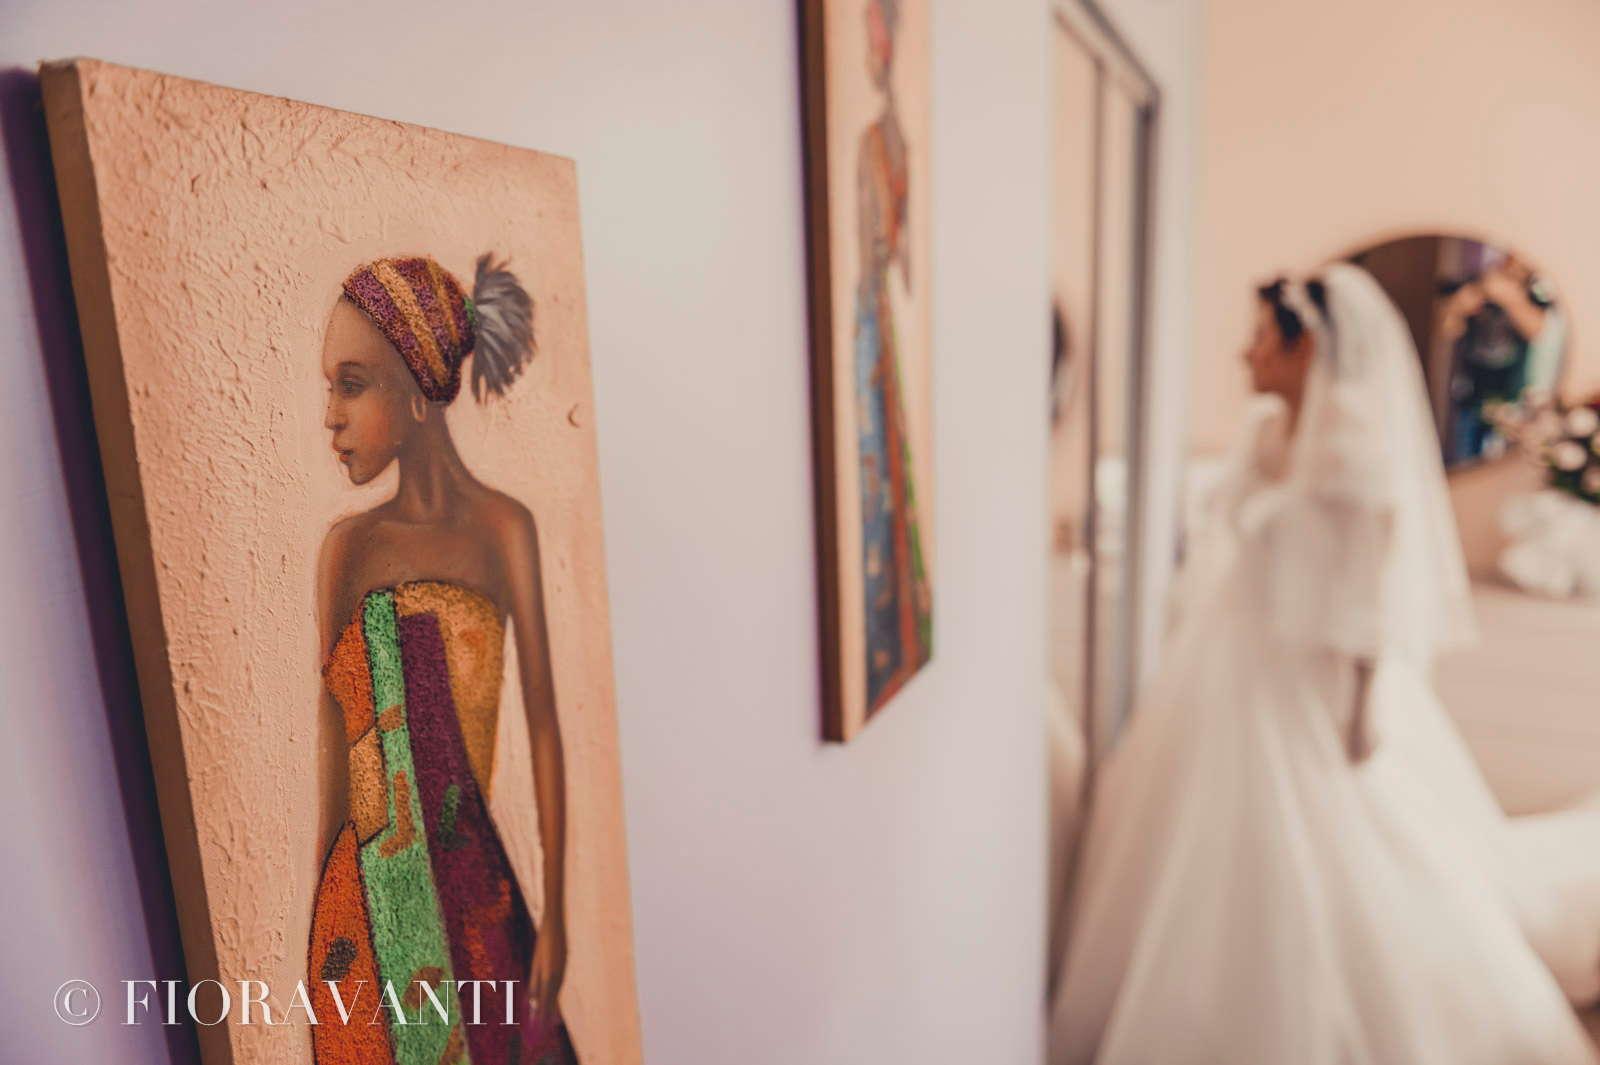 Sara&Edgar Studio Fotografico Fioravanti Ascoli Piceno